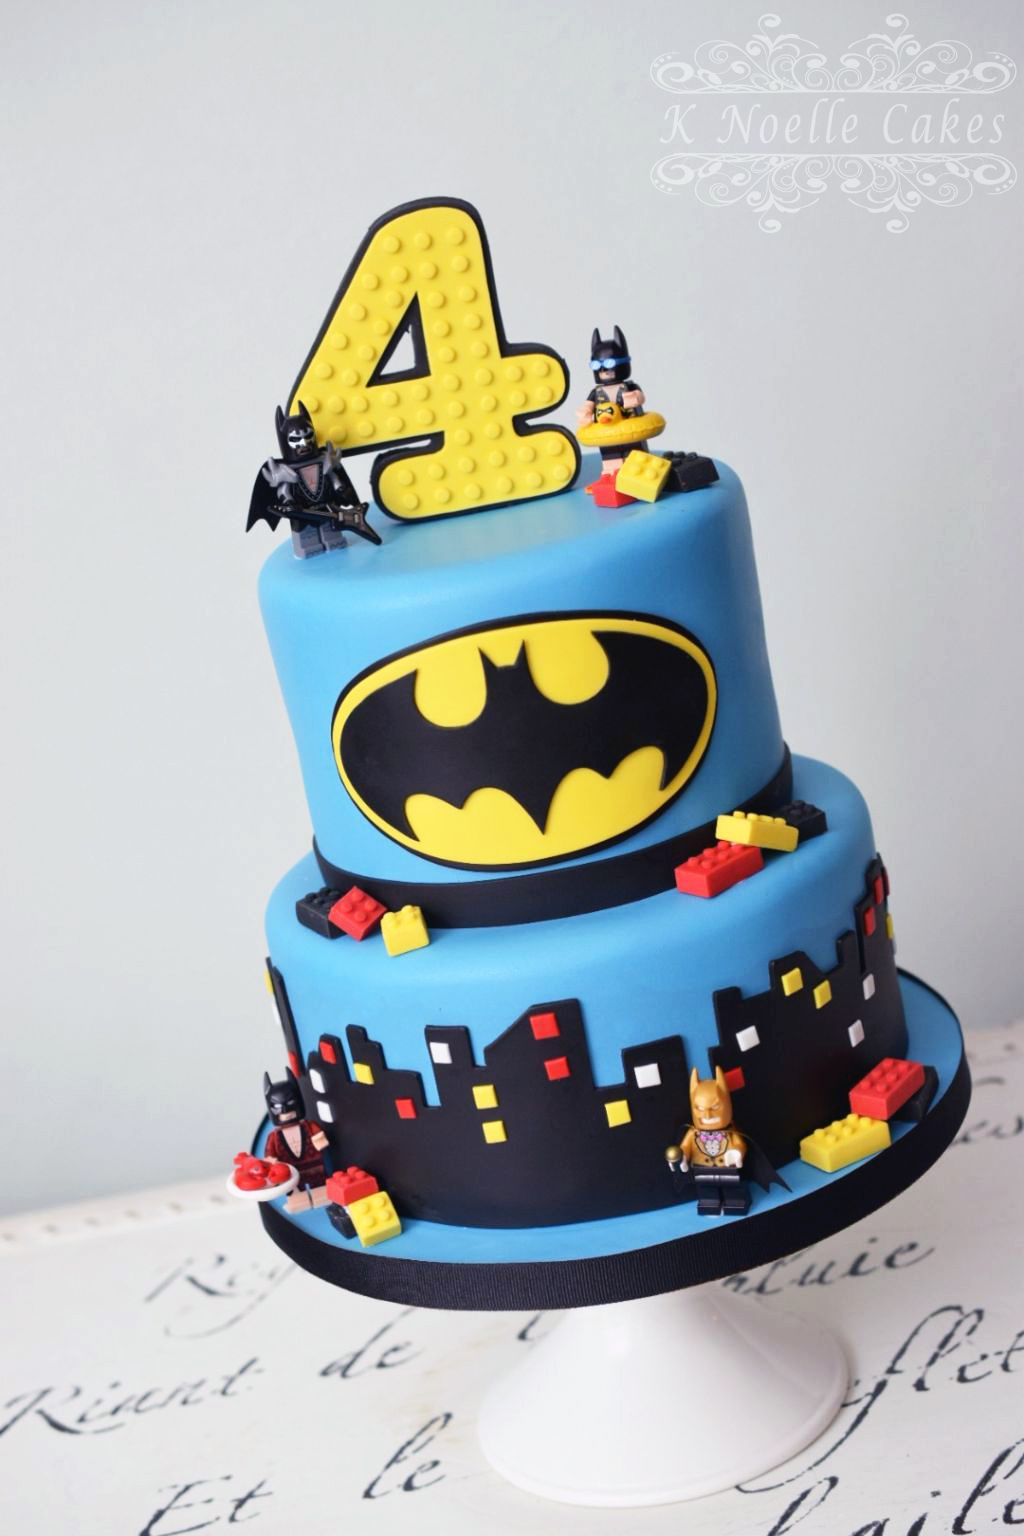 Batman Lego Theme Cake By K Noelle Cakes Lego Batman Birthday